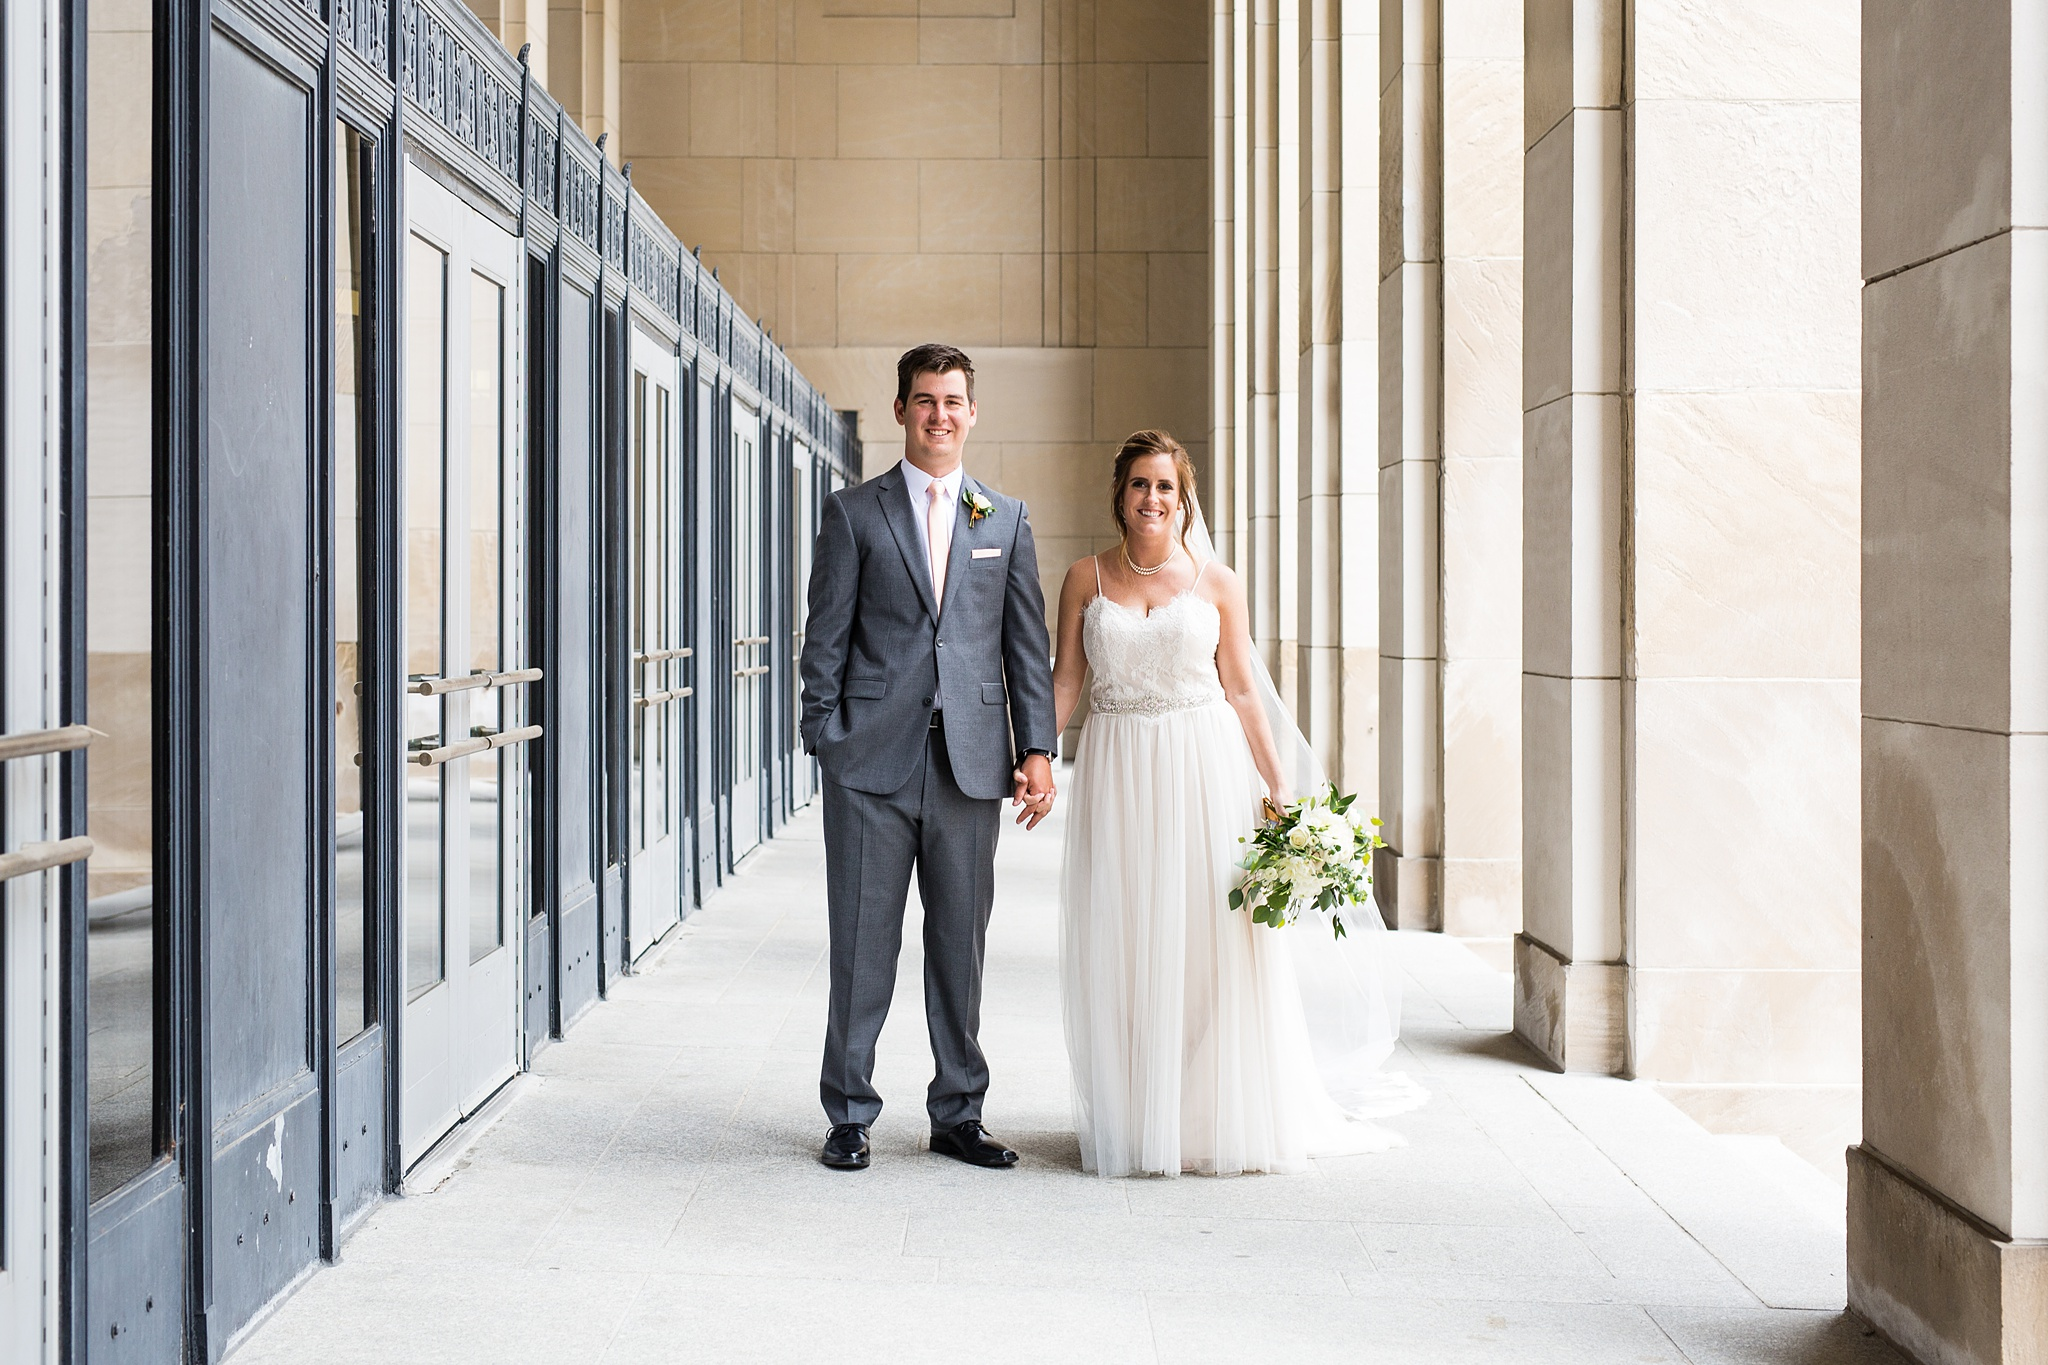 Meghan_Drew_Grand_Rapids_Cheney_place_Wedding042.JPG